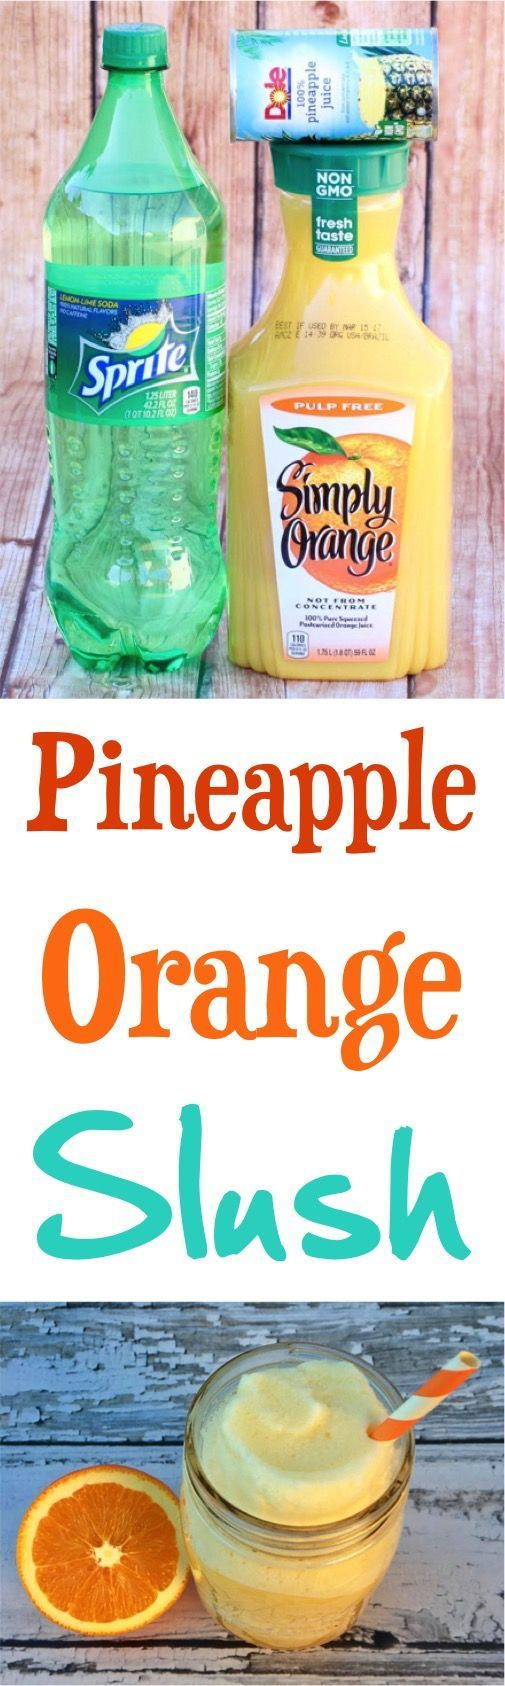 Slush Recipe!  This Pineapple Orange Beverage will satisfy those slush cravings!   NeverEndingJourneys.com